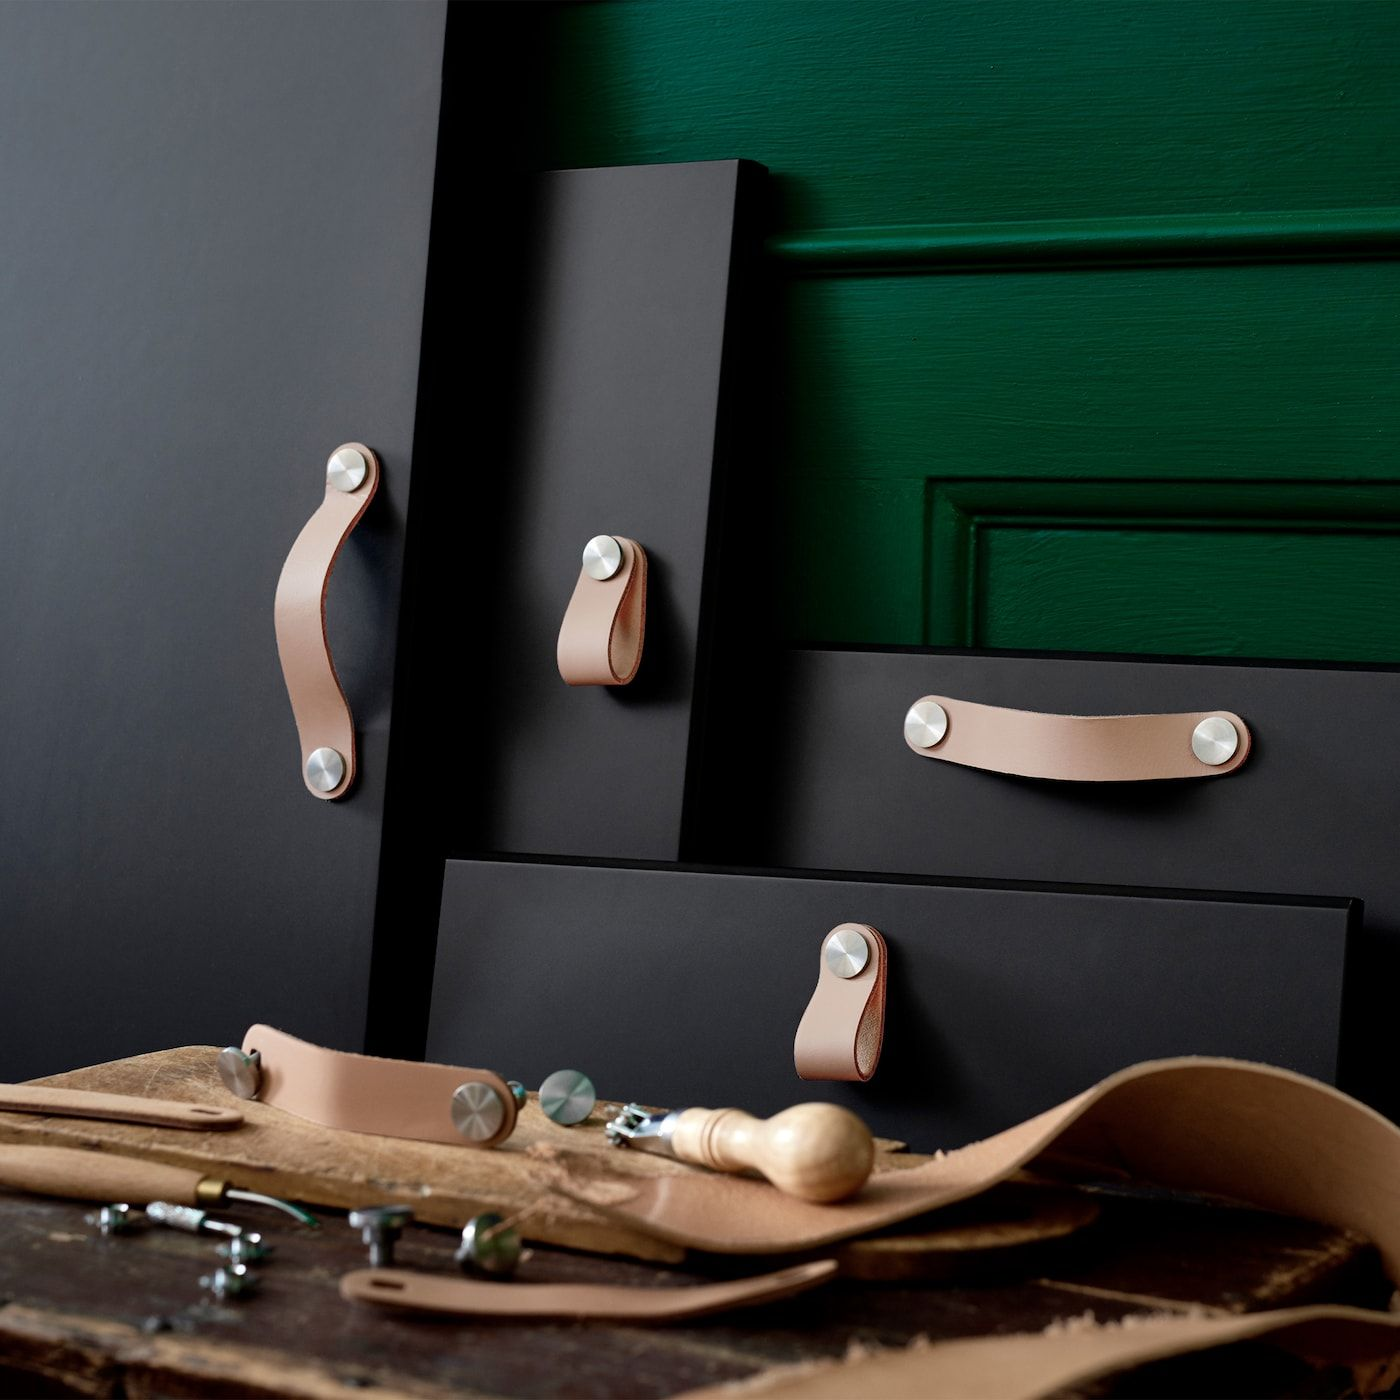 Kjokkenprodukter Poignee Meuble Poignee Placard Meuble De Cuisine Ikea